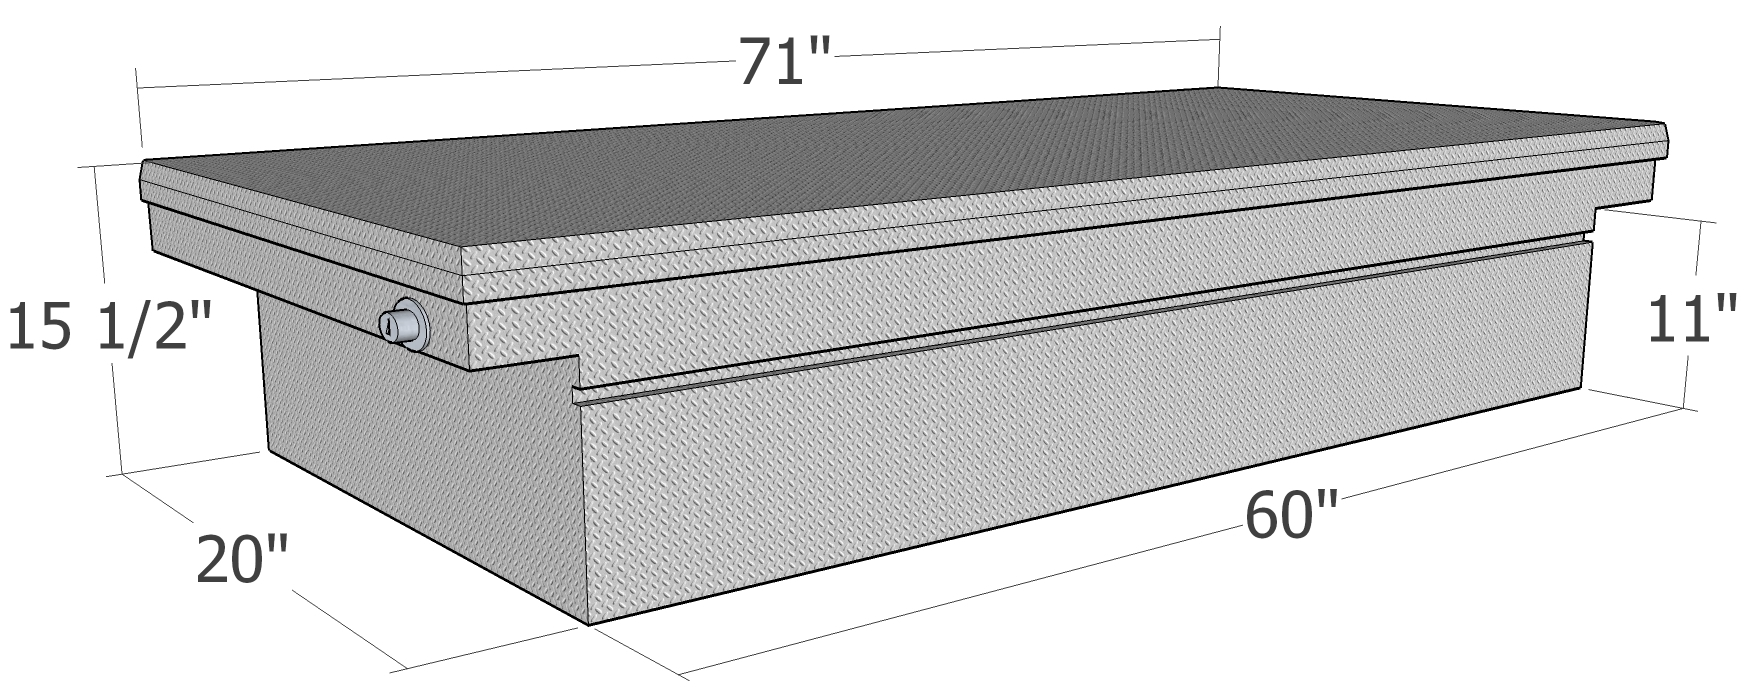 truck tool box size